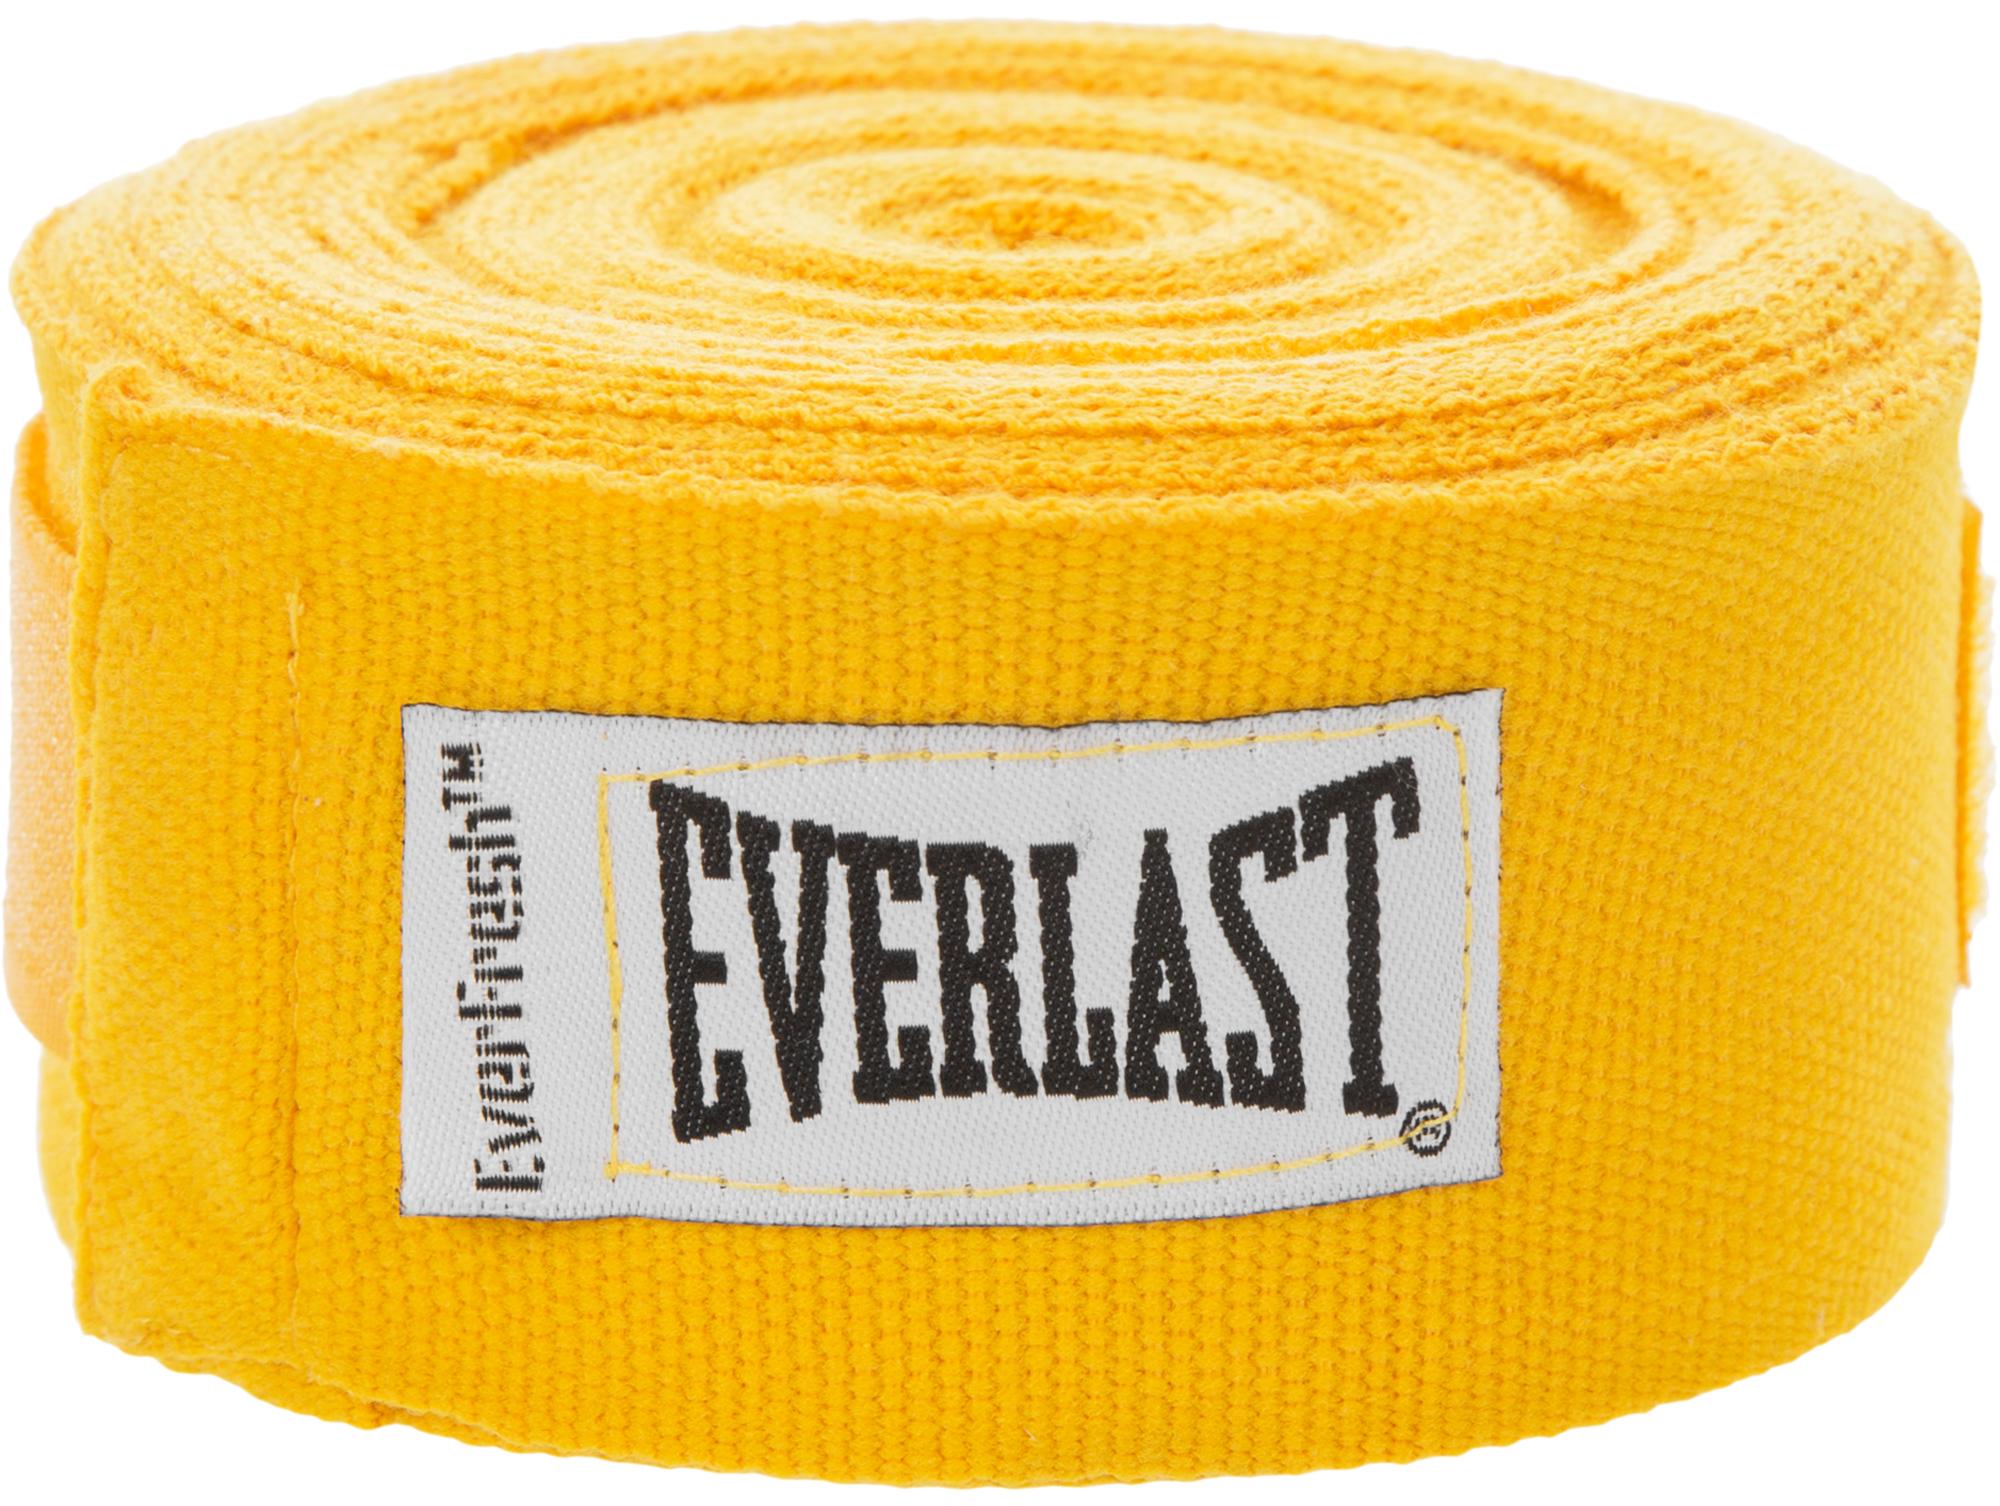 Everlast Бинт Everlast, 4,55 м, 2 шт.